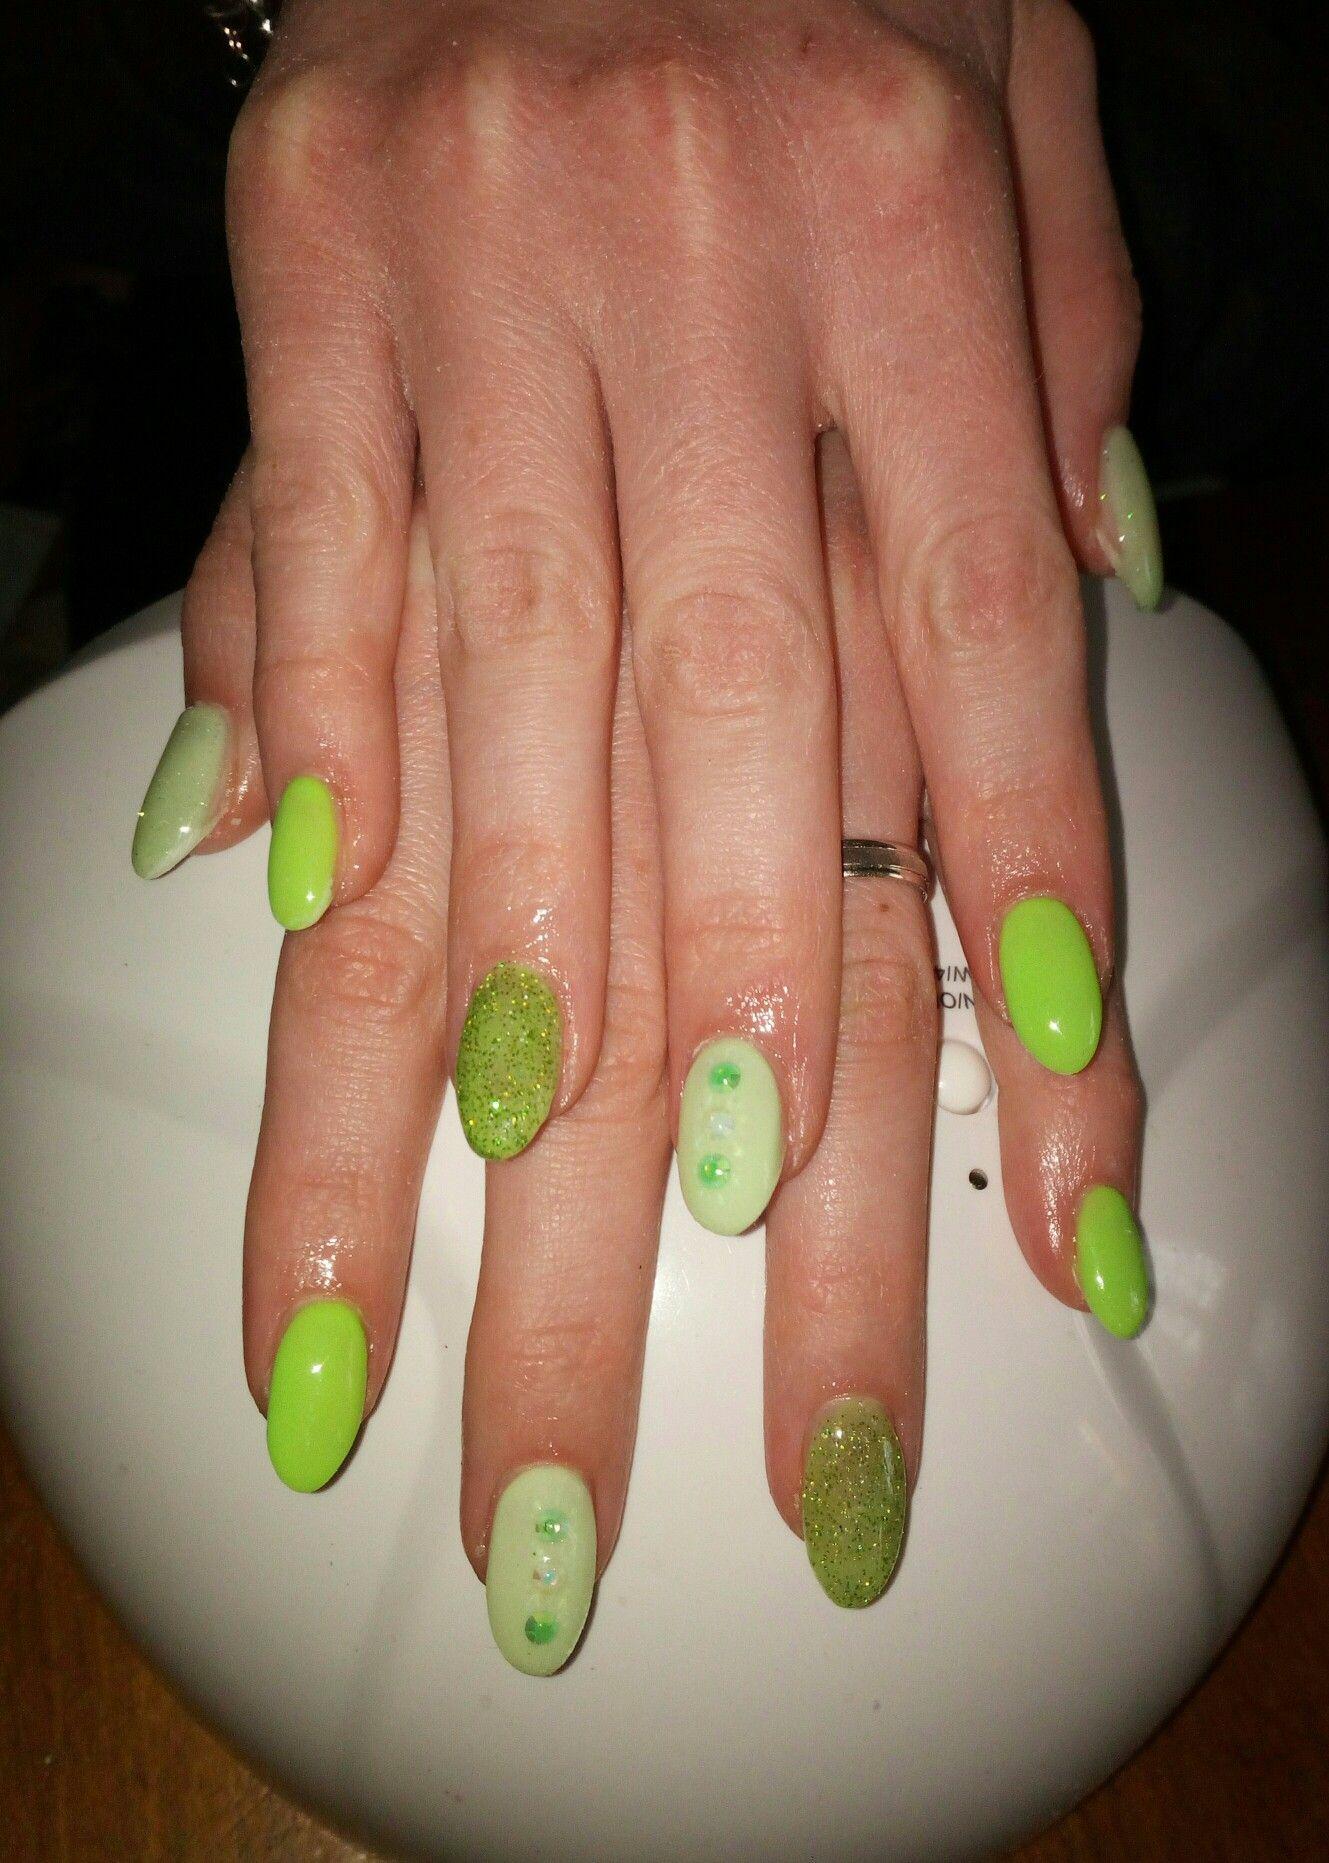 Unghie gel a mandorla verde fluo con brillantini idea primavera estate 2019